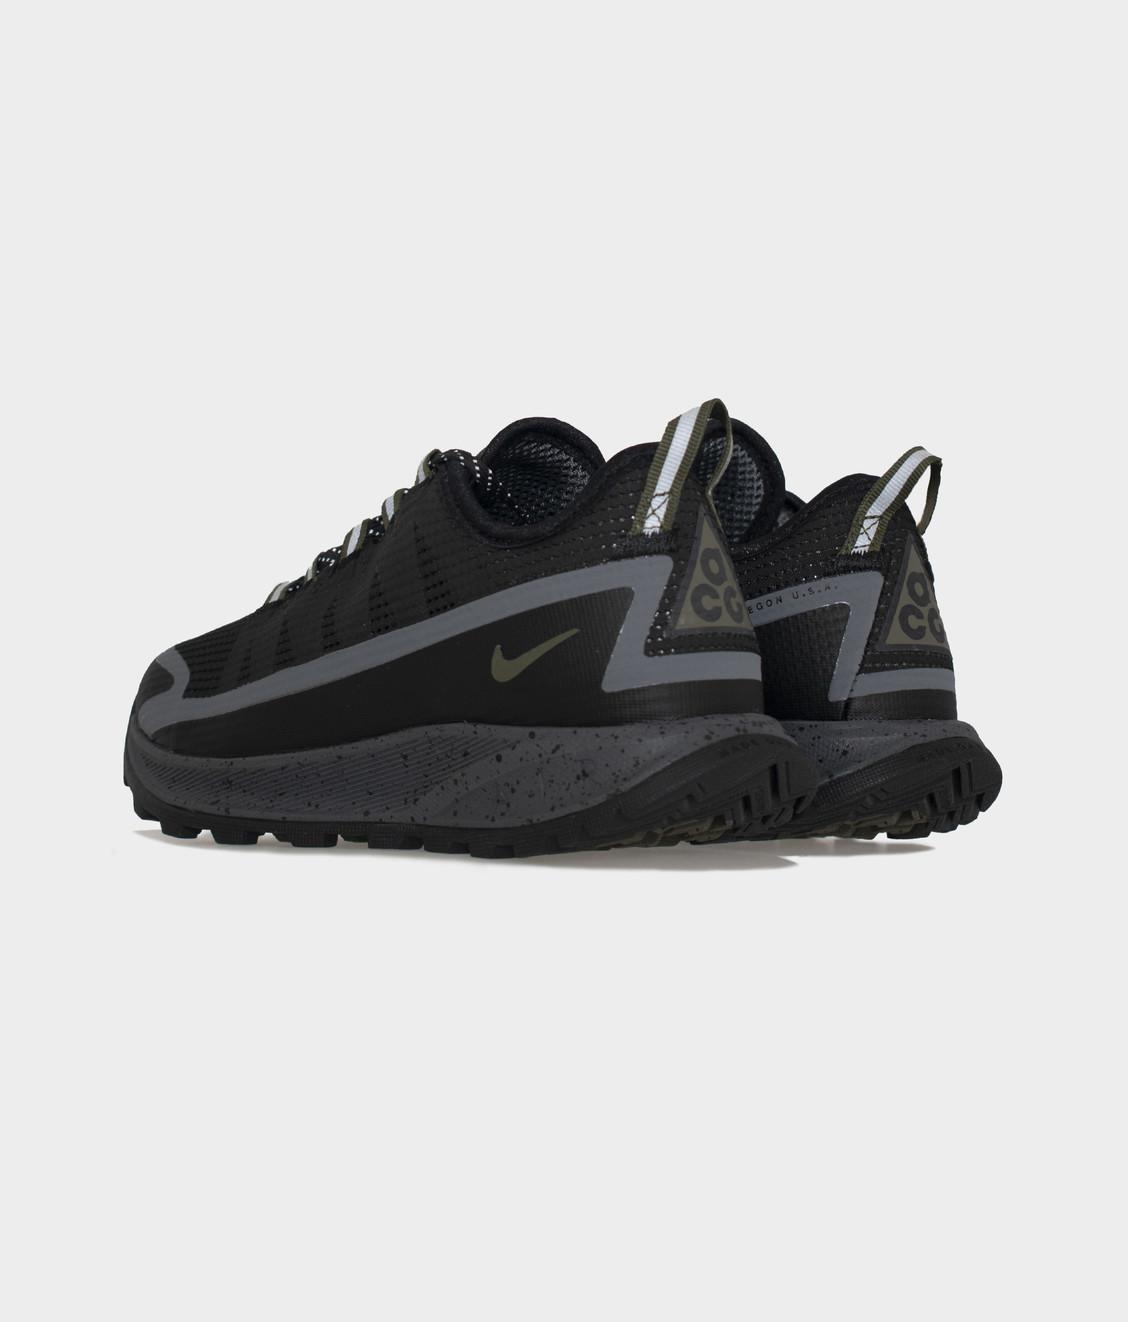 Nike ACG Air Nasu Black Cargo Khaki